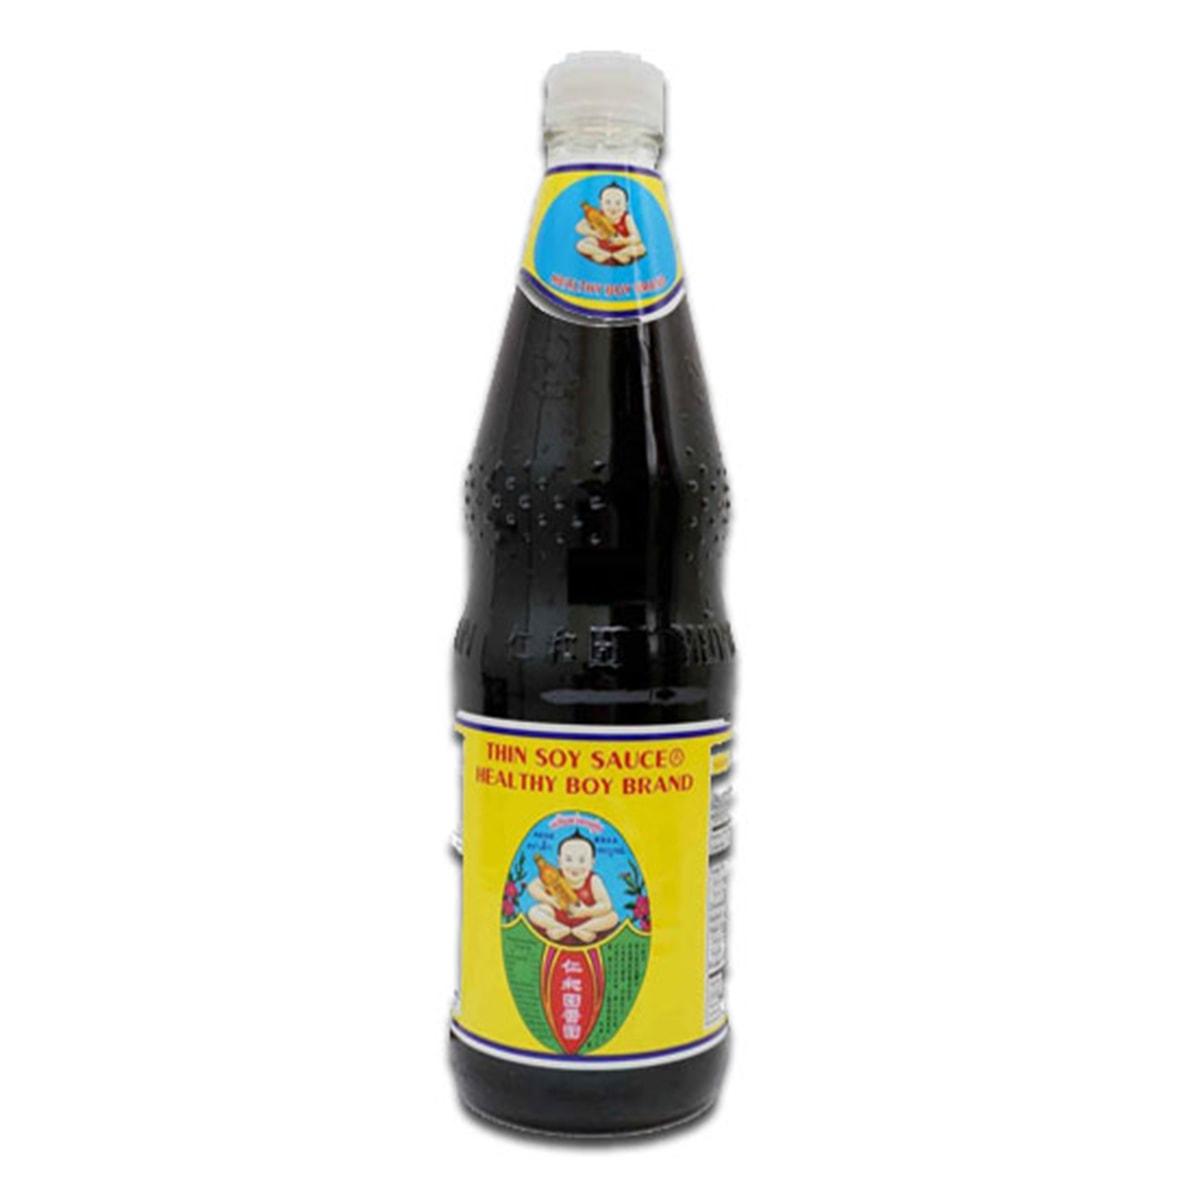 Buy Healthy Boy Brand Thin Soy Sauce - 700 ml